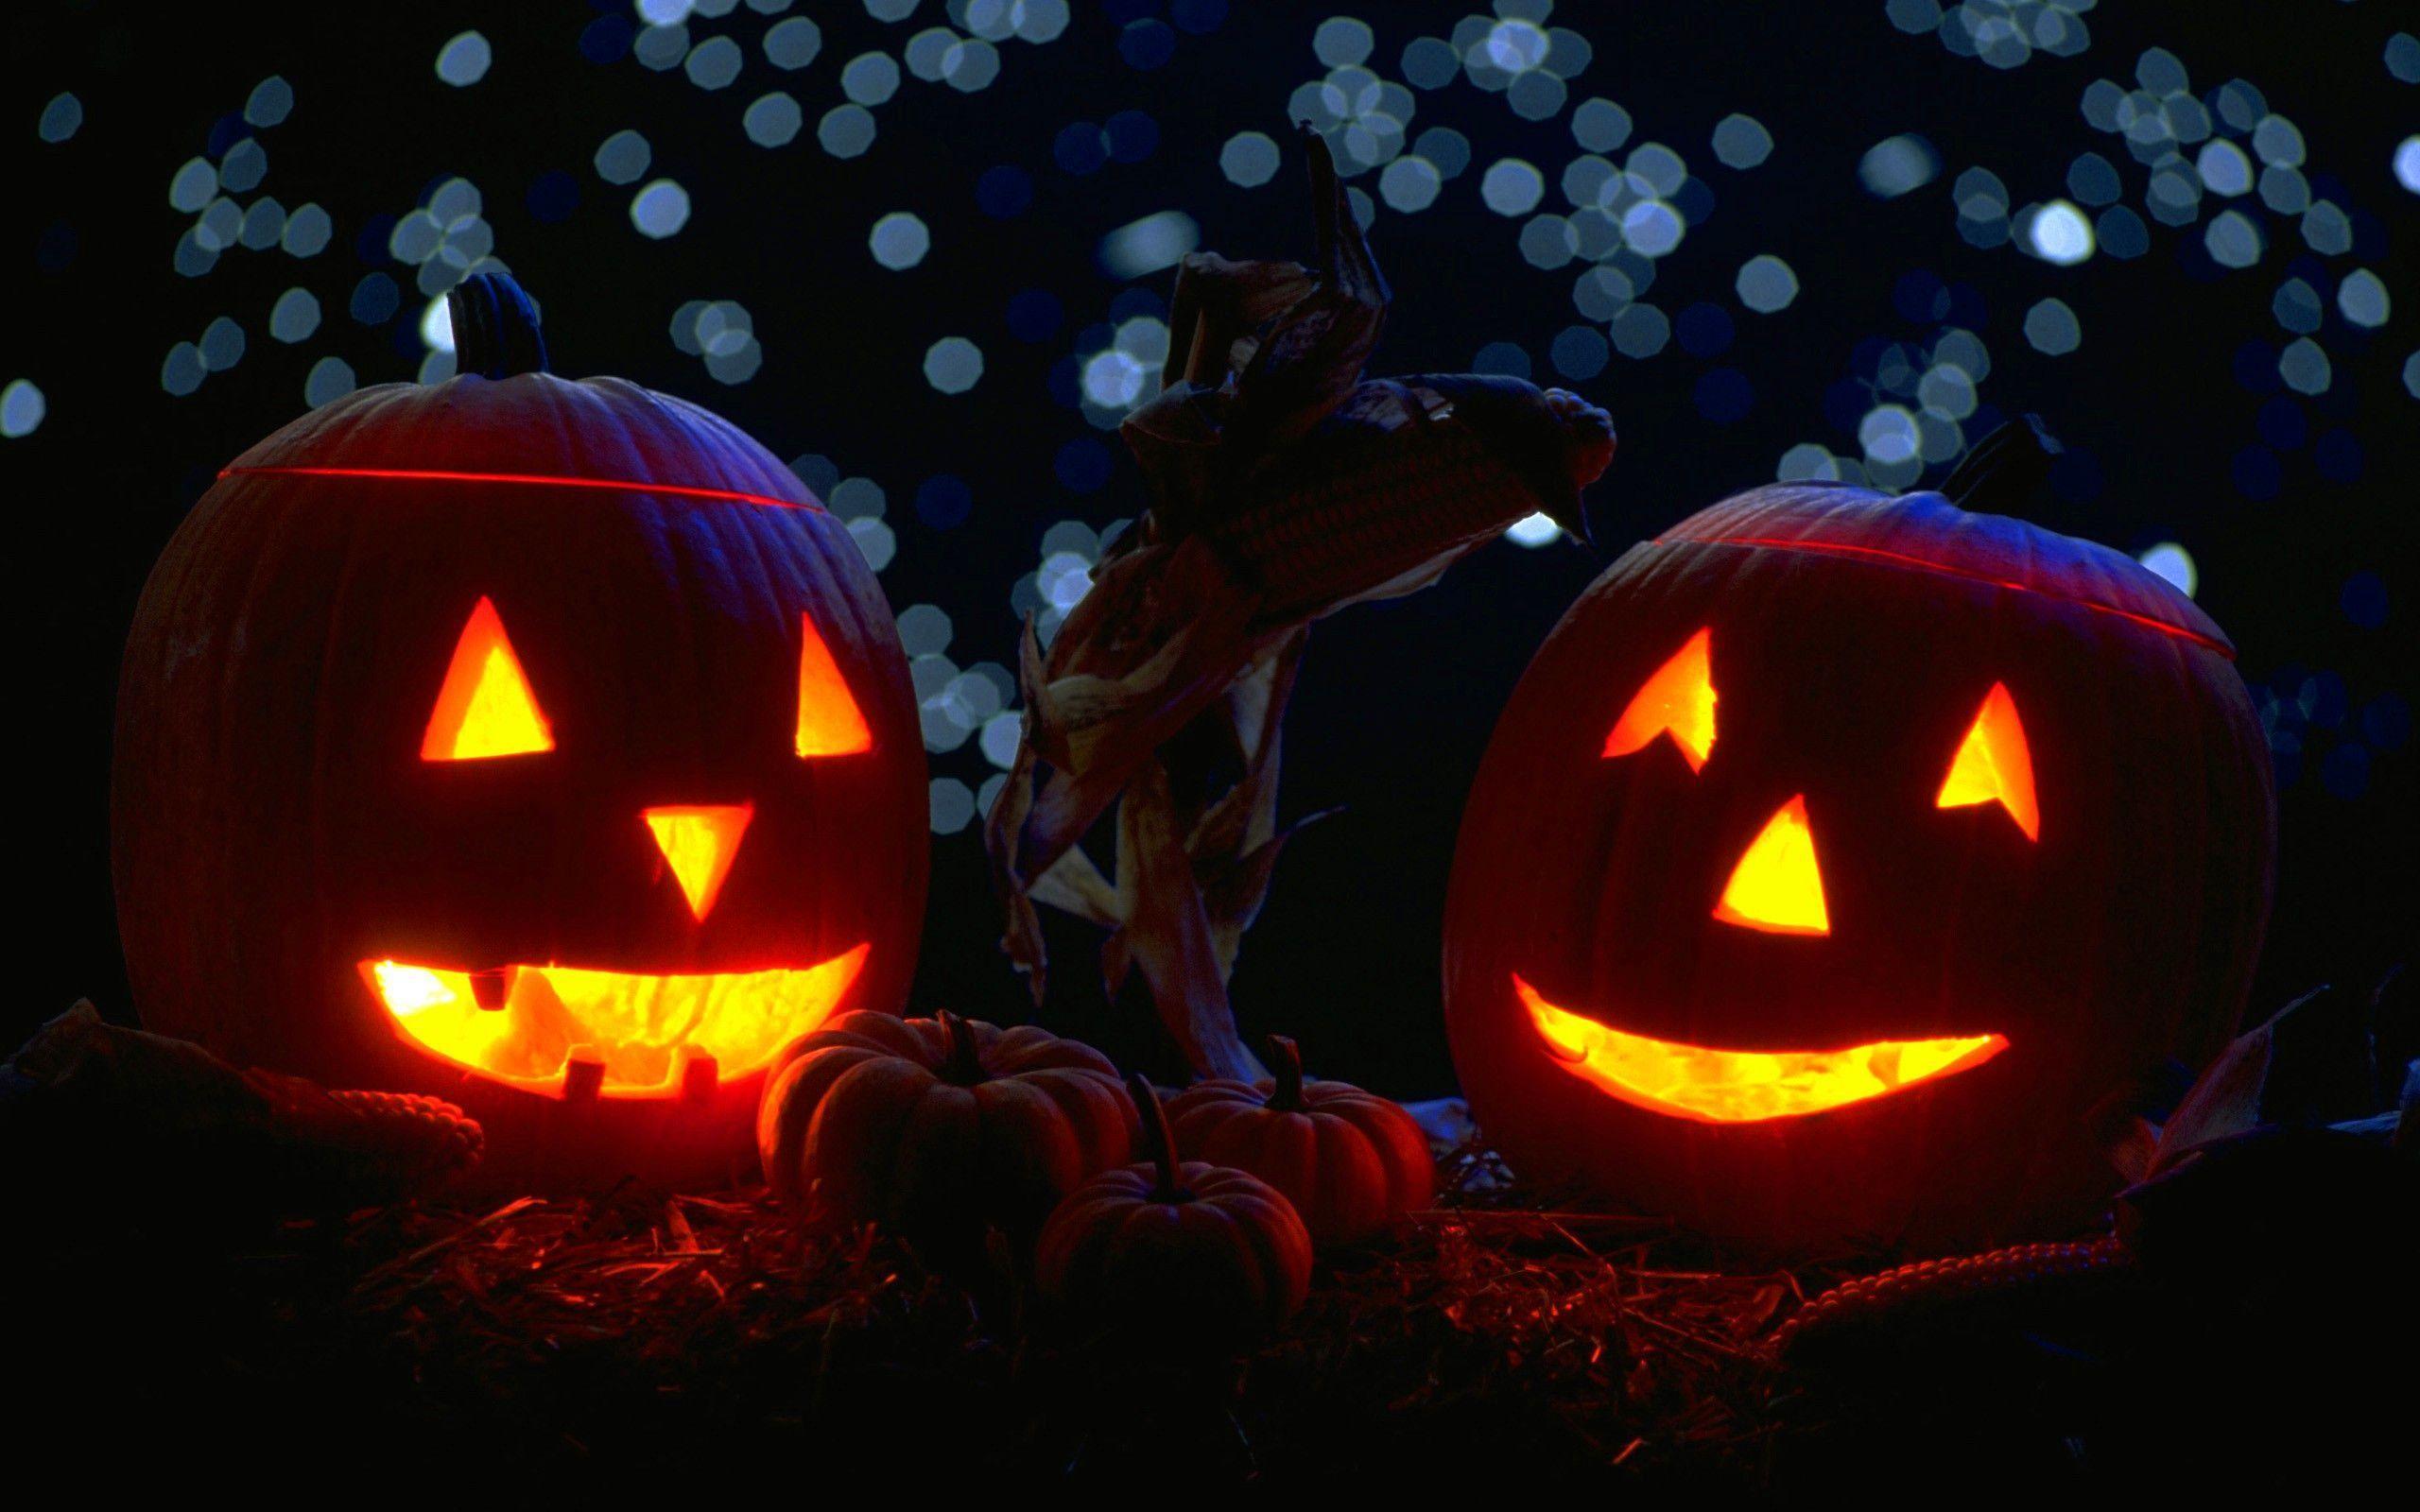 Halloween Pumpkin Backgrounds - Wallpaper Cave